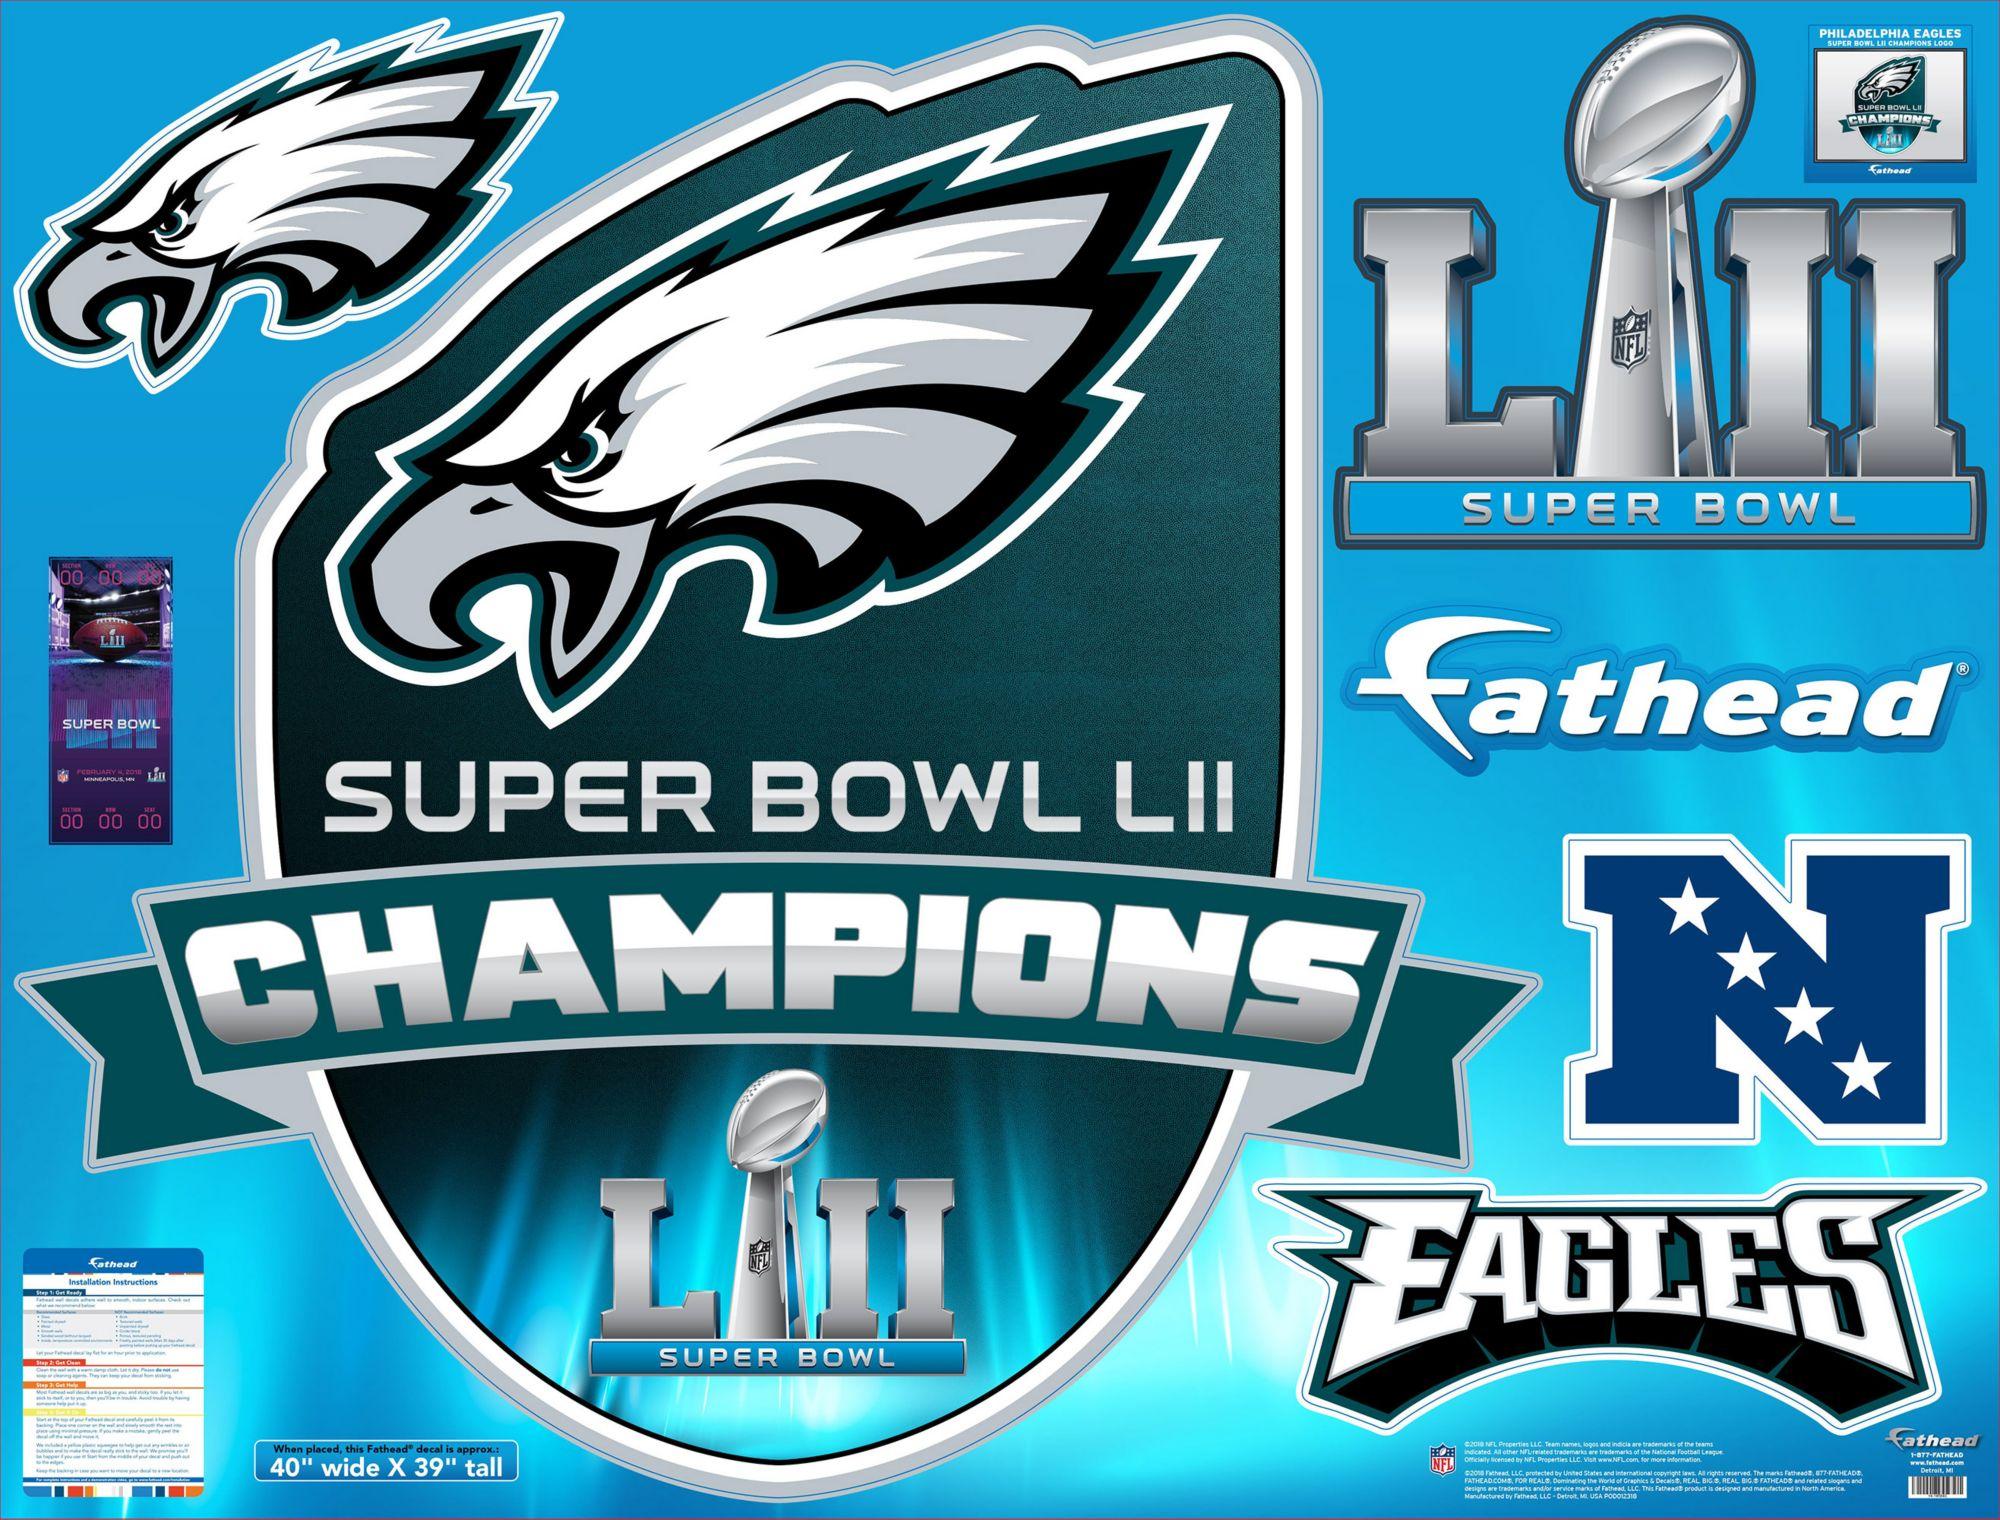 Fathead Super Bowl LII Champions Philadelphia Eagles Real Big Logo ...